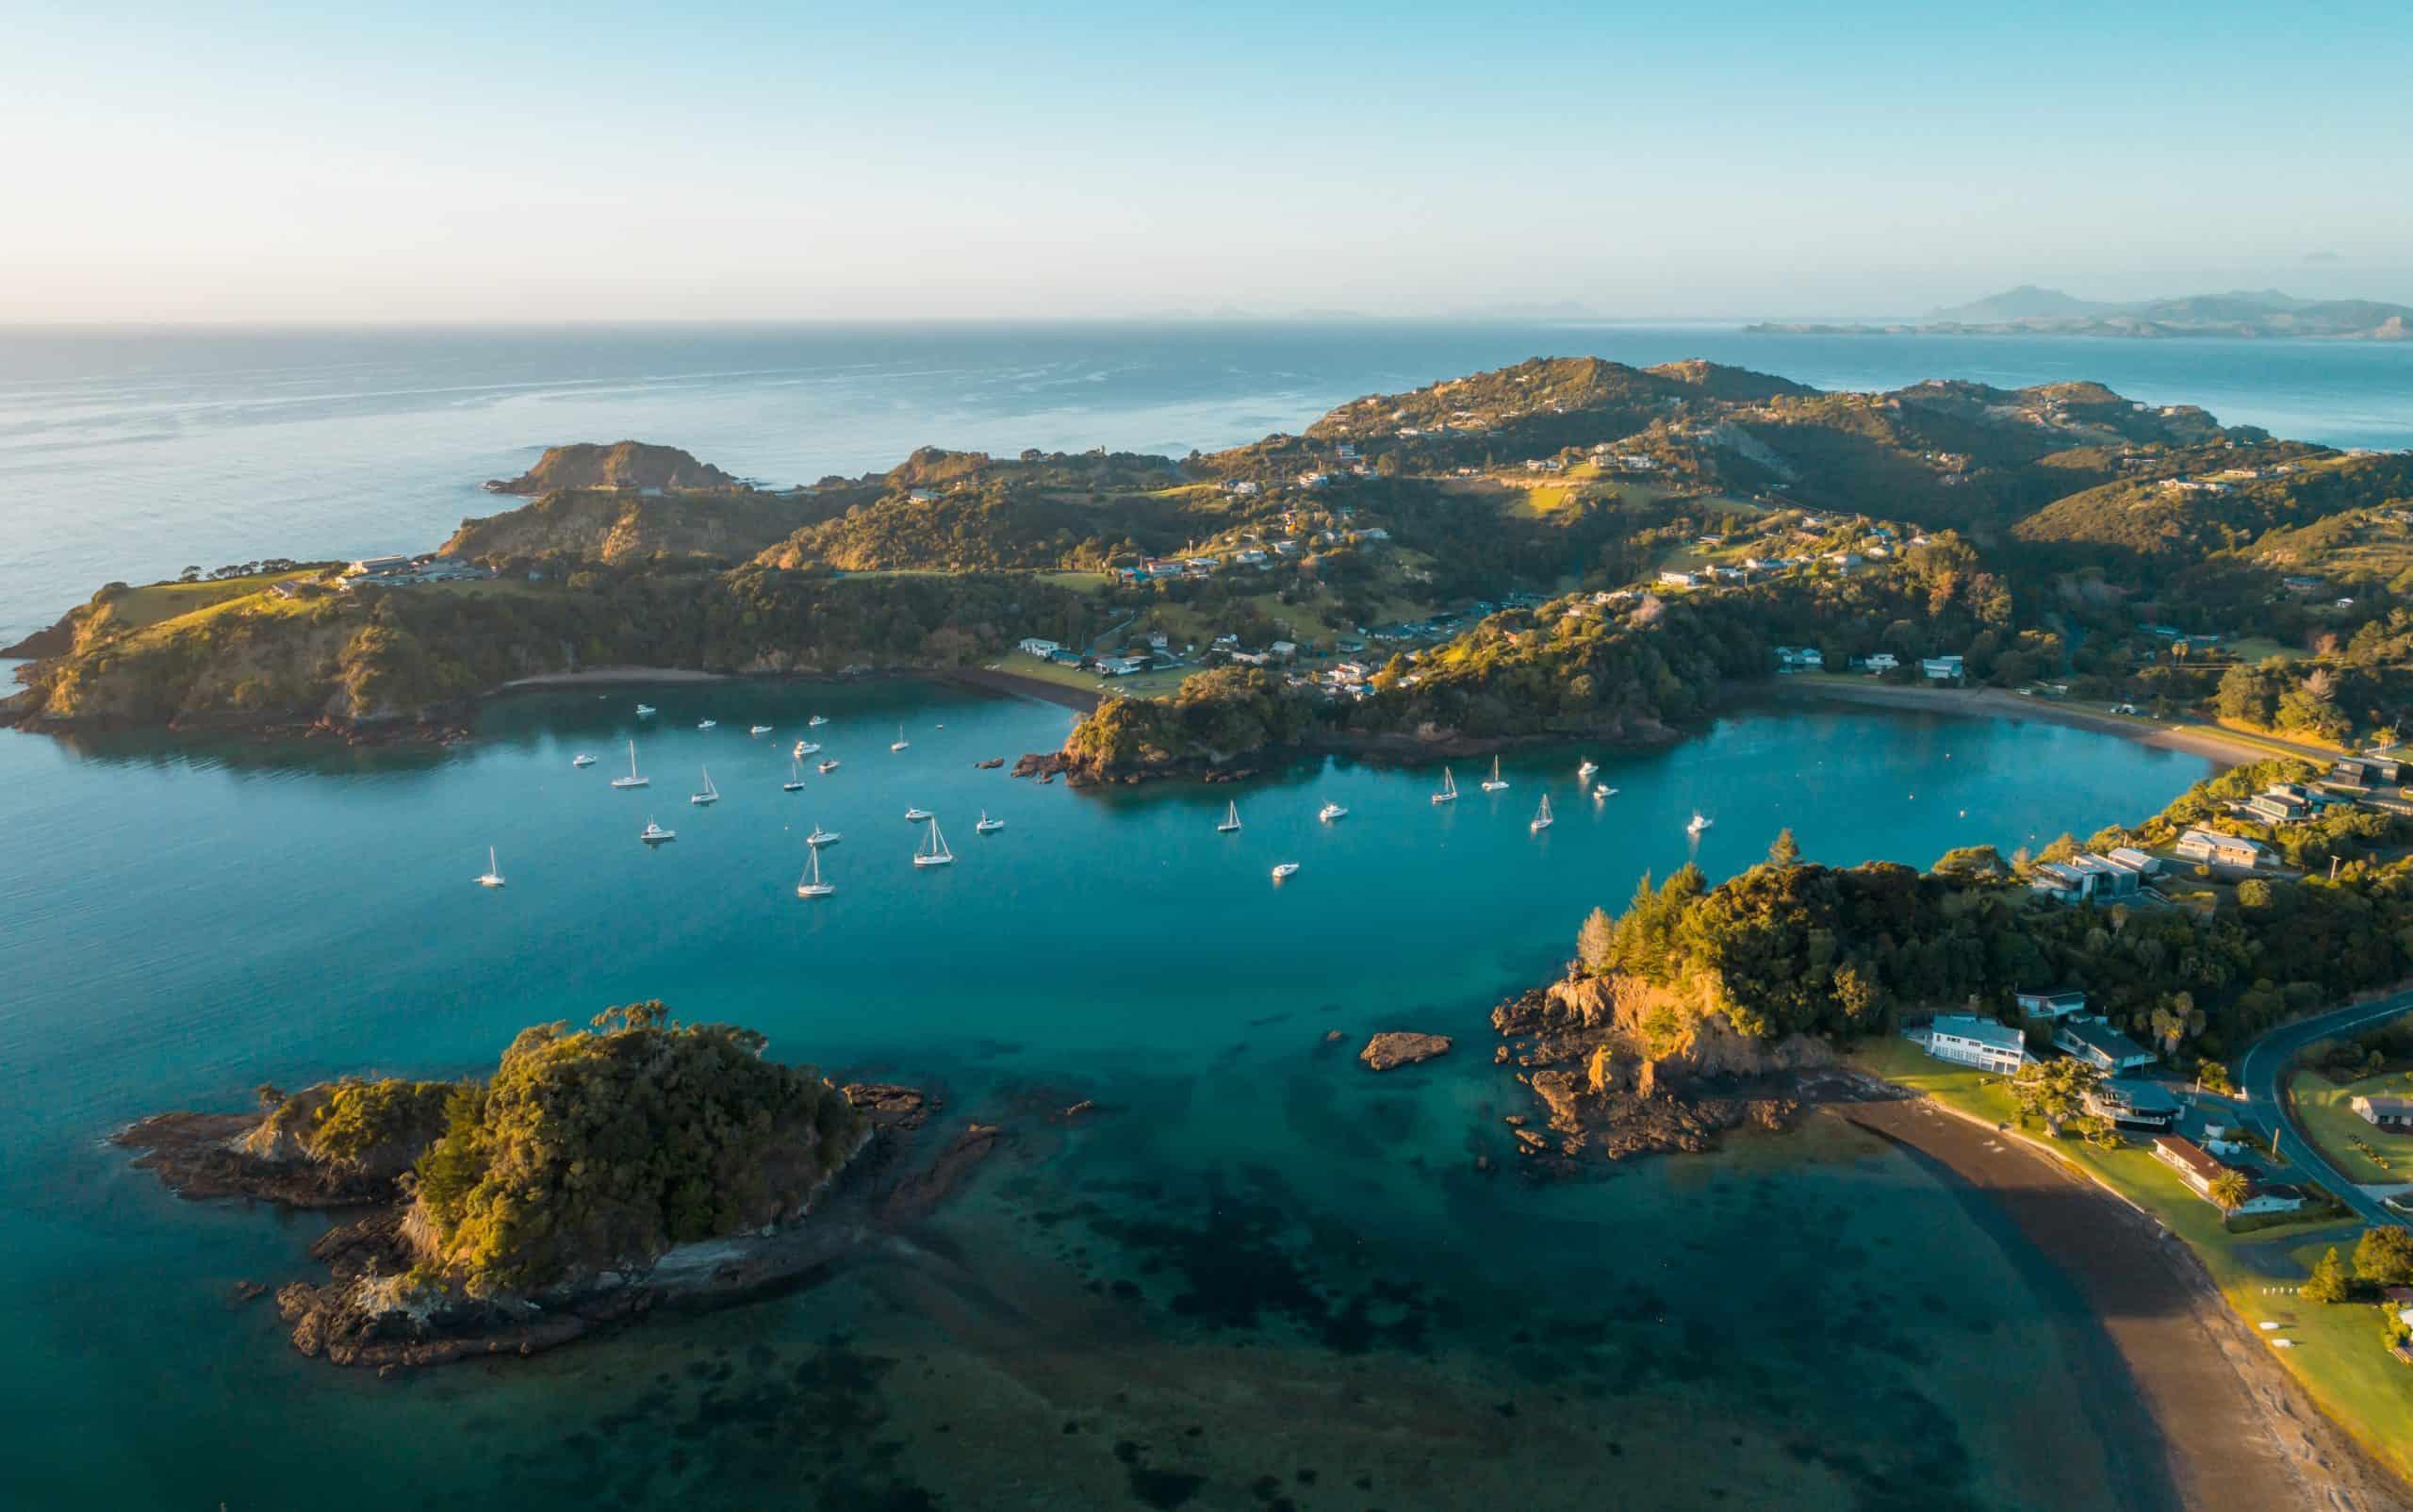 Bay of Islands, New Zealand | Odyssey Traveller